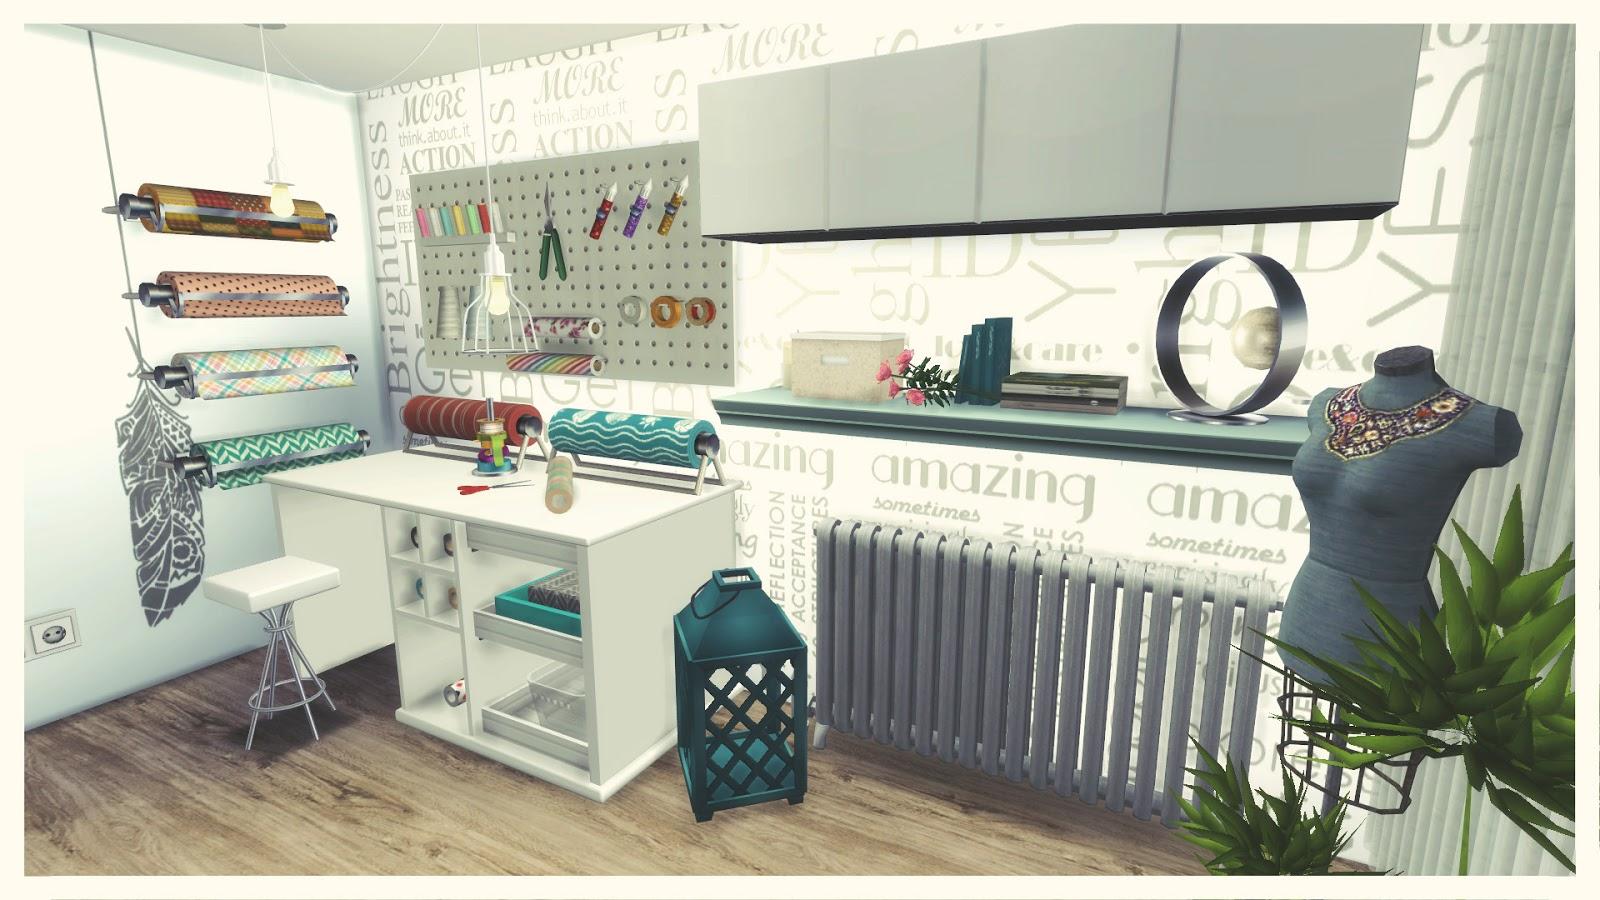 Sims 4  Fashion Design Studio Room  Mods for download  Dinha